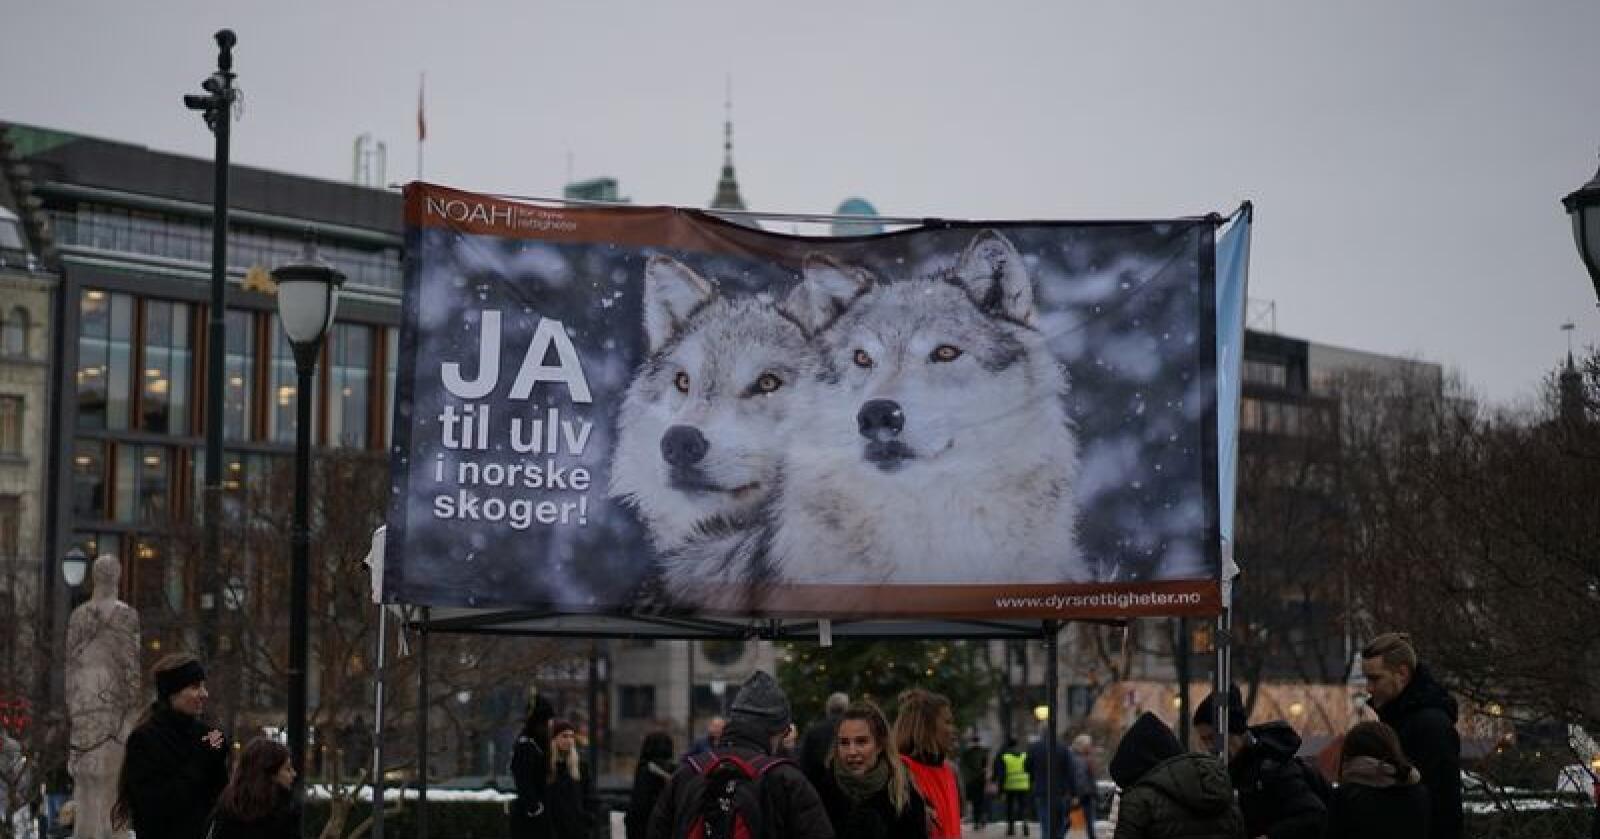 NOAH-markering for ulv på Eidsvoll plass utenfor Stortinget i midten av desemeber. Foto: Benjamin Hernes Vogl